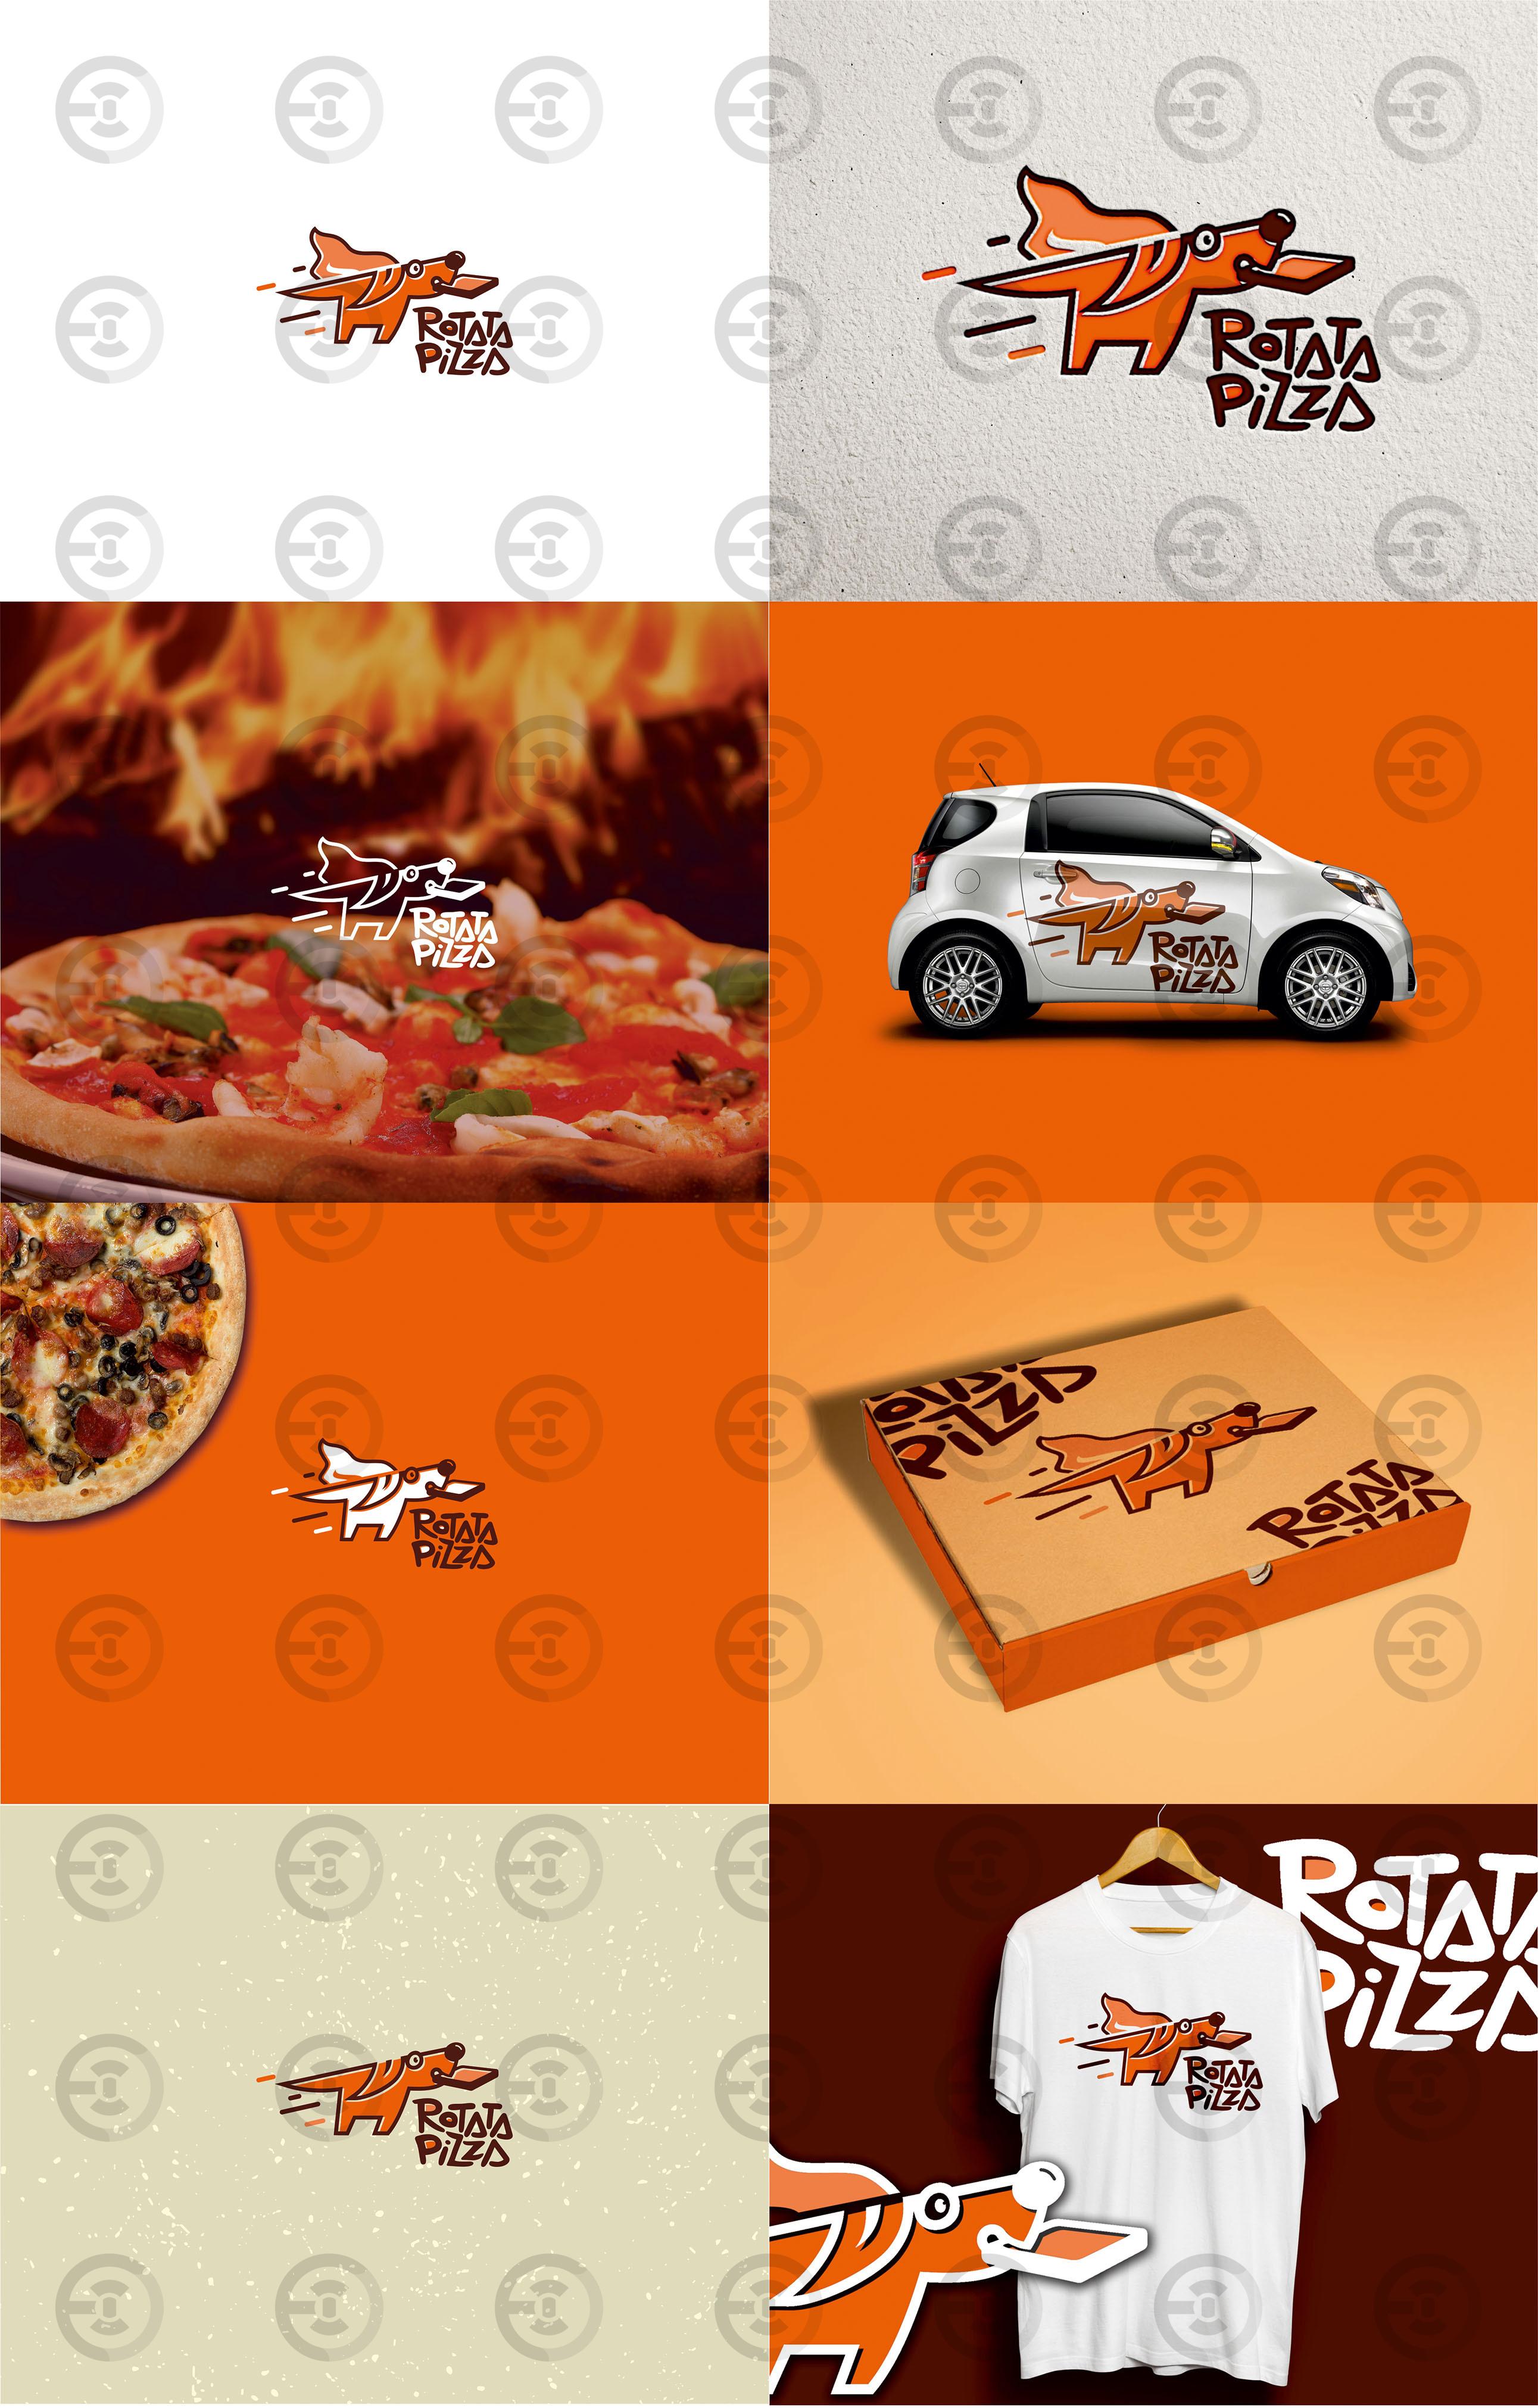 Rotata Pizza2.jpg